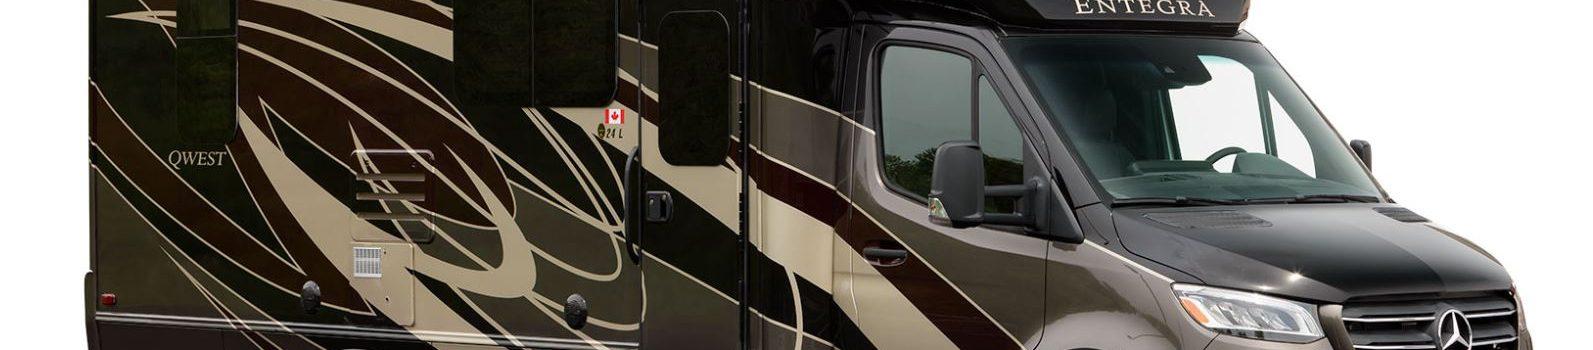 Entegra Coach Quest RV